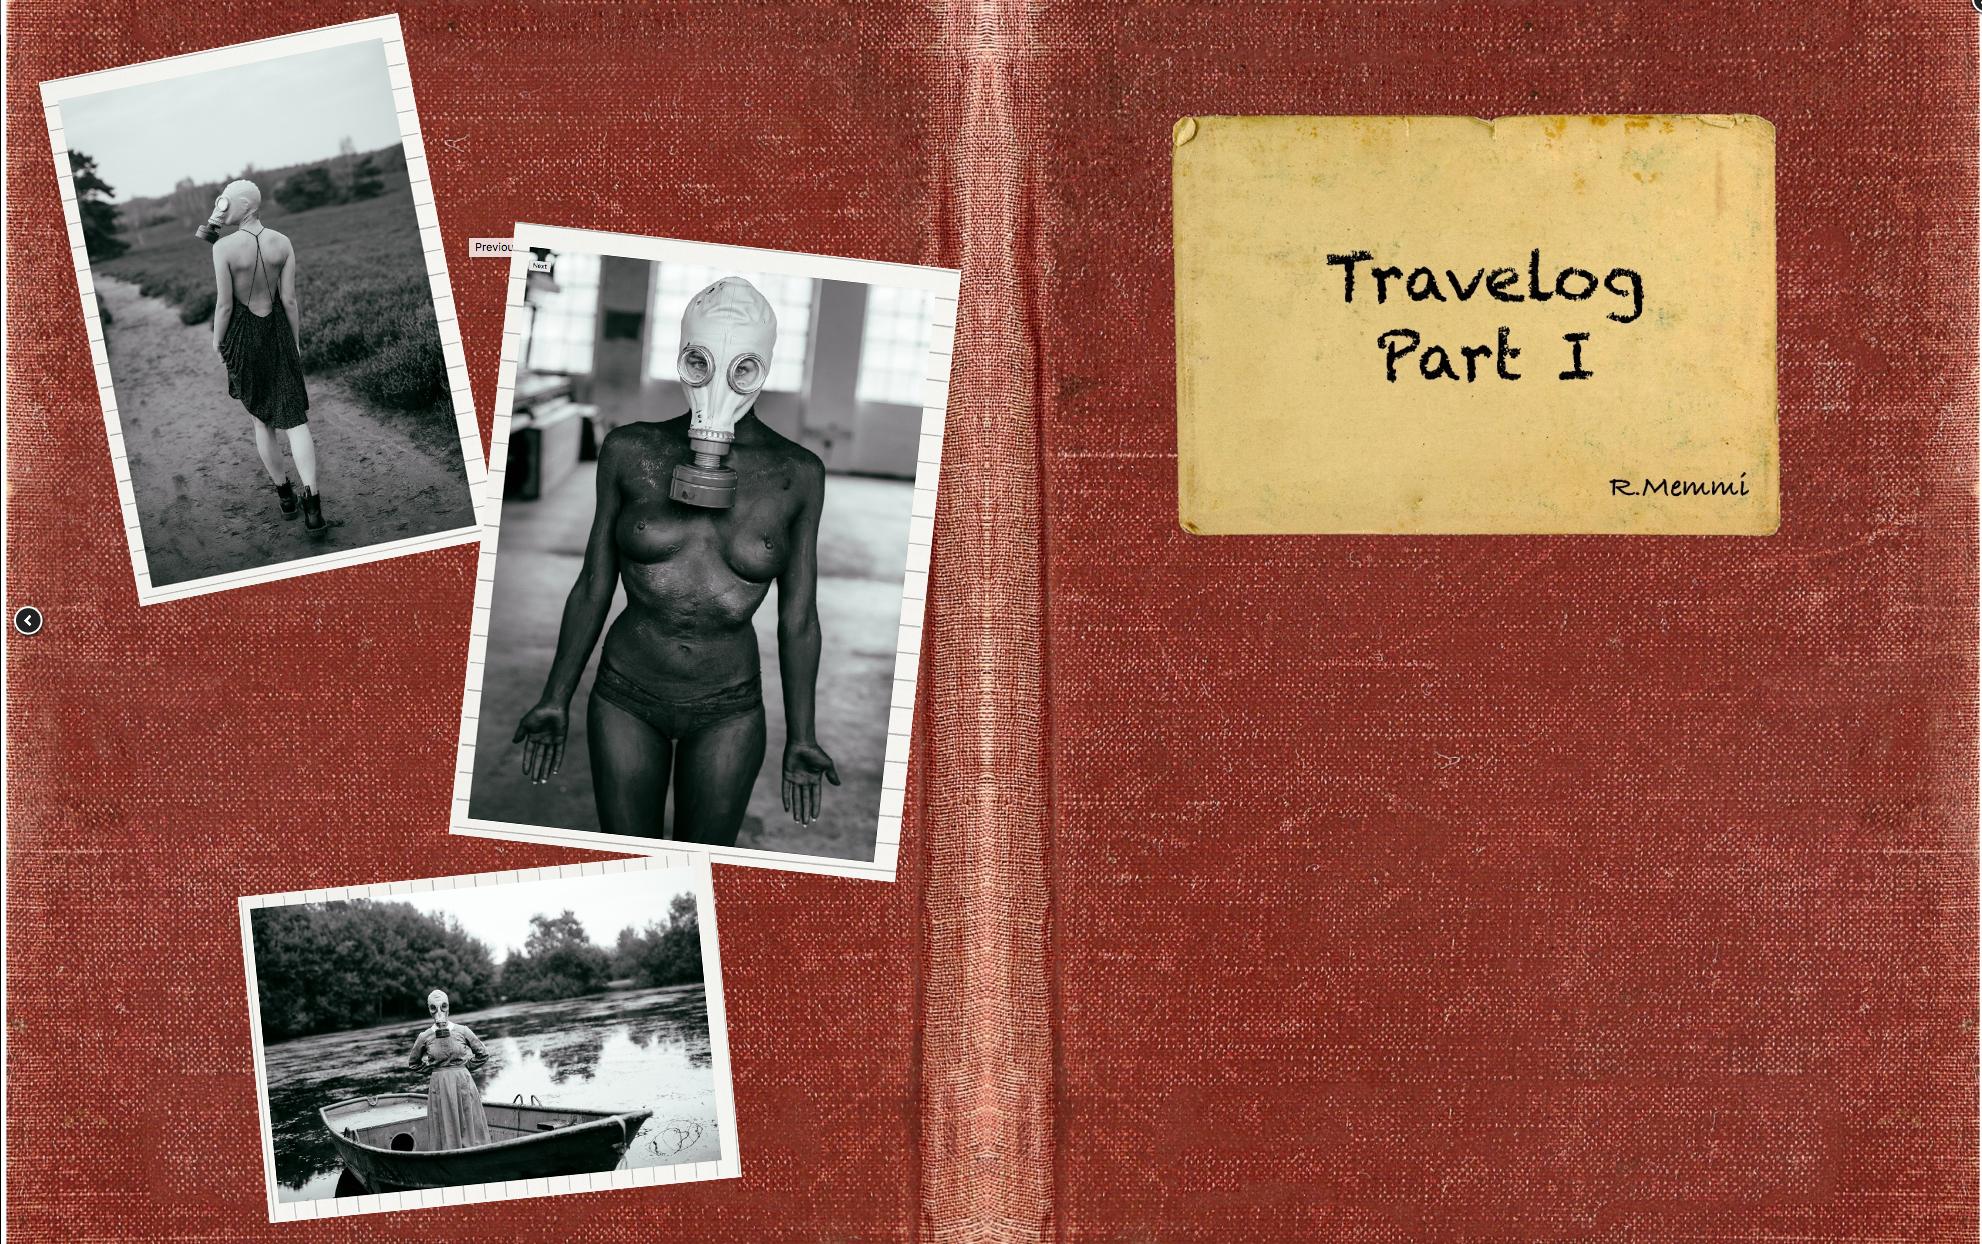 travellog